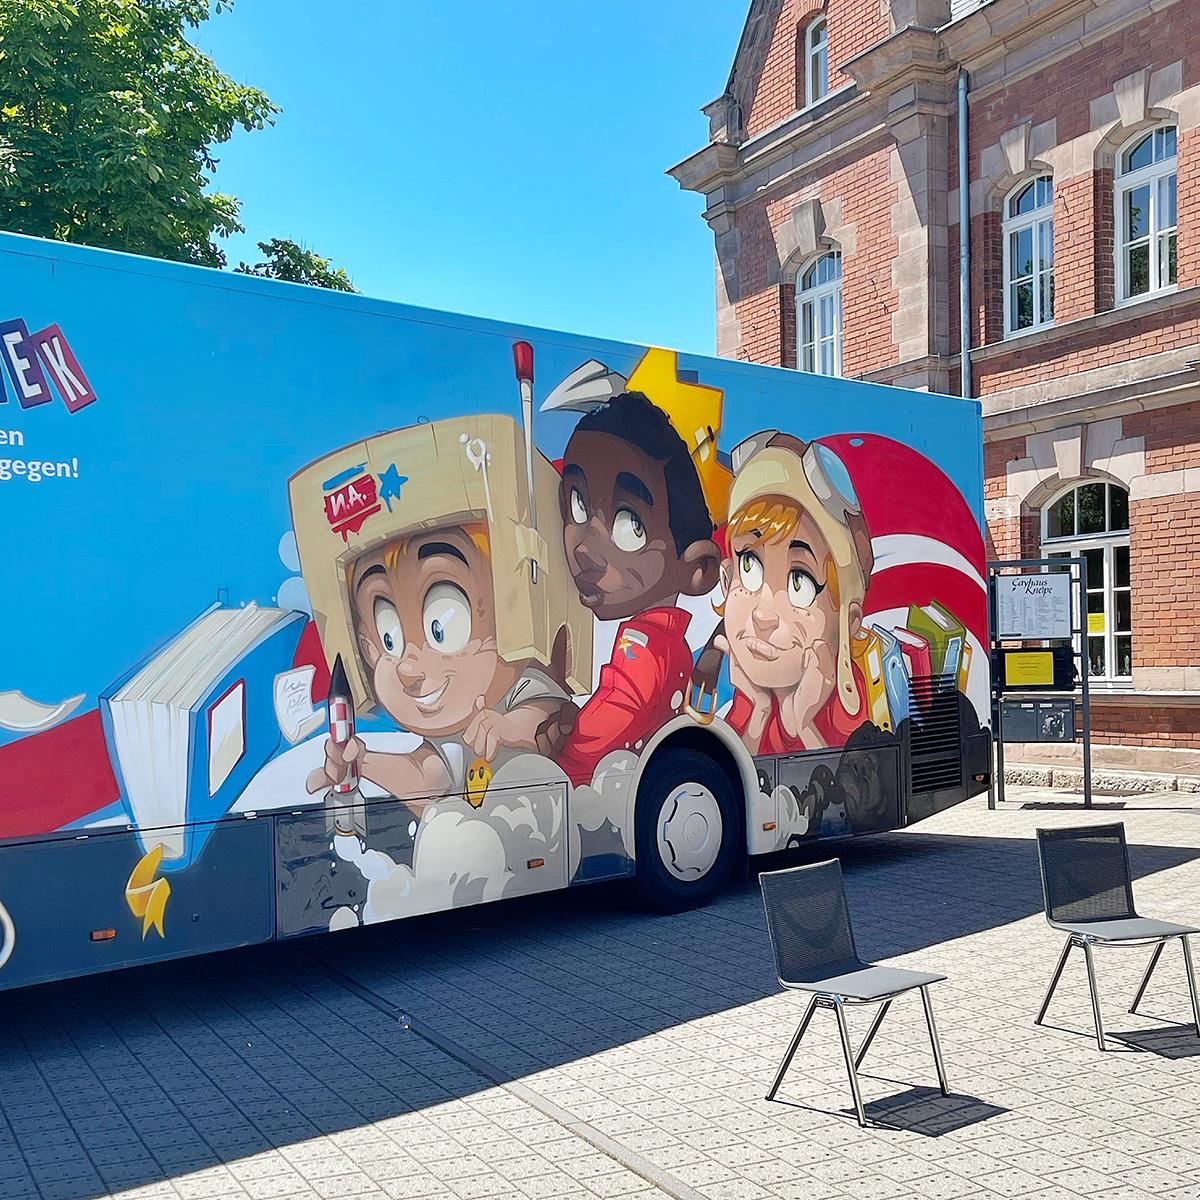 Bus der Stadtbibliothek – Street Art on Wheels